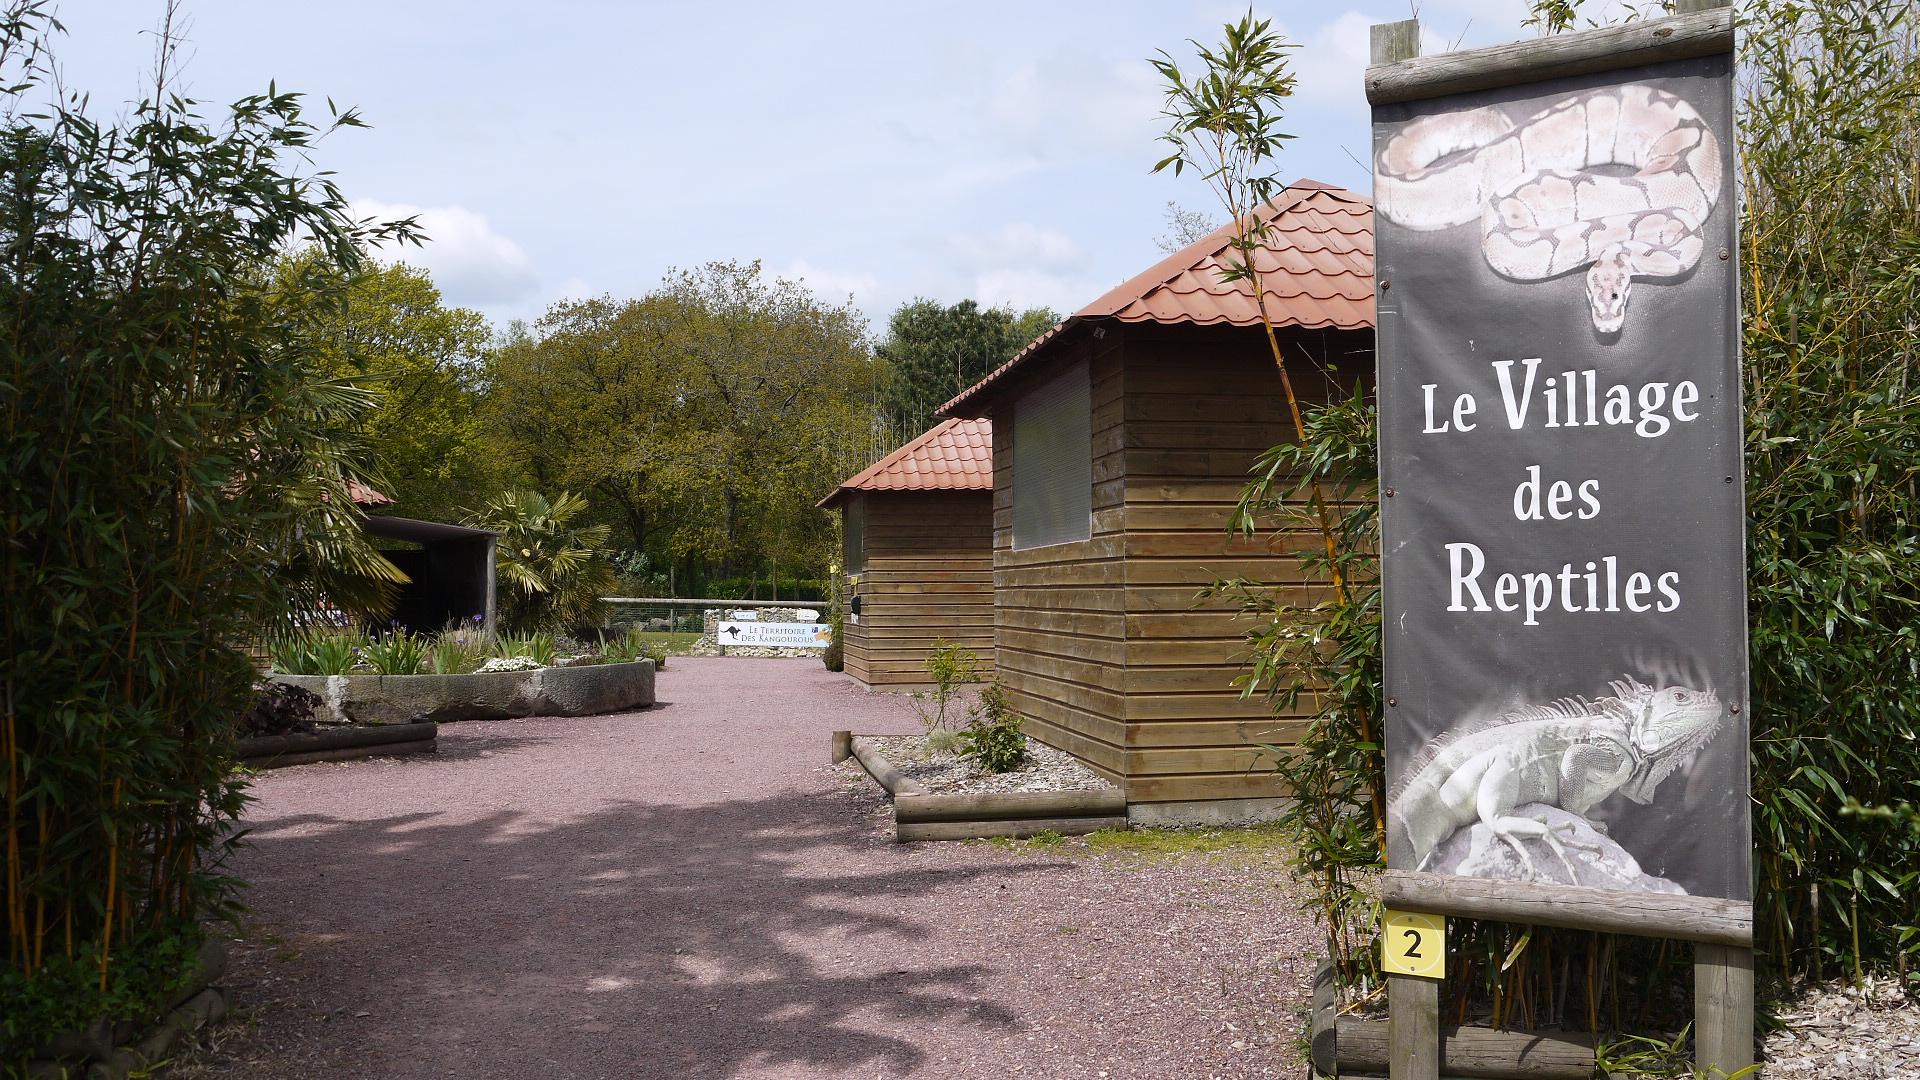 Village des reptiles